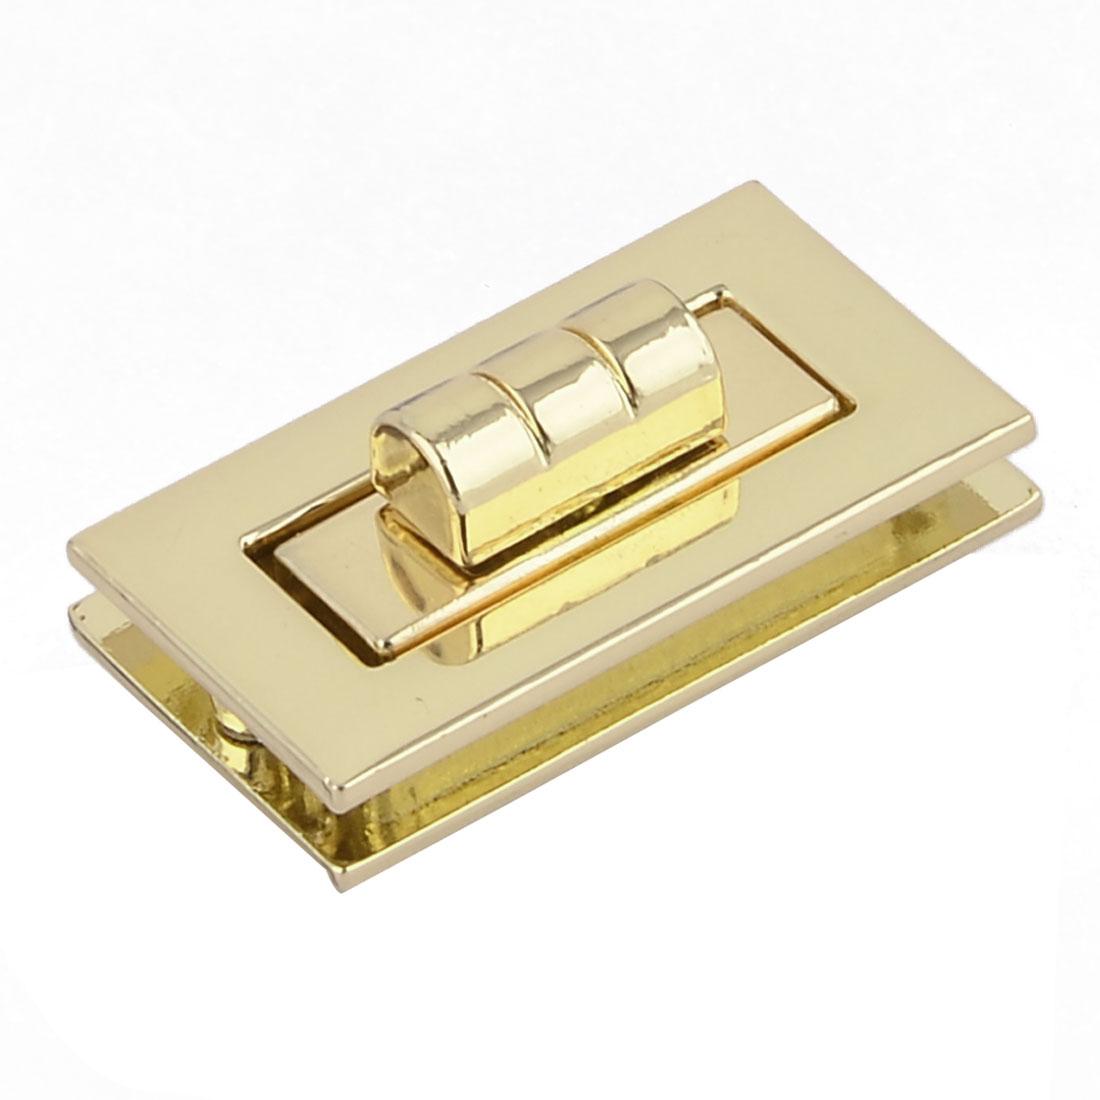 "Luggage Clothing Metal Rectangle Shaped Lock 1.1"" x 0.43"" Inside Size Gold Tone"